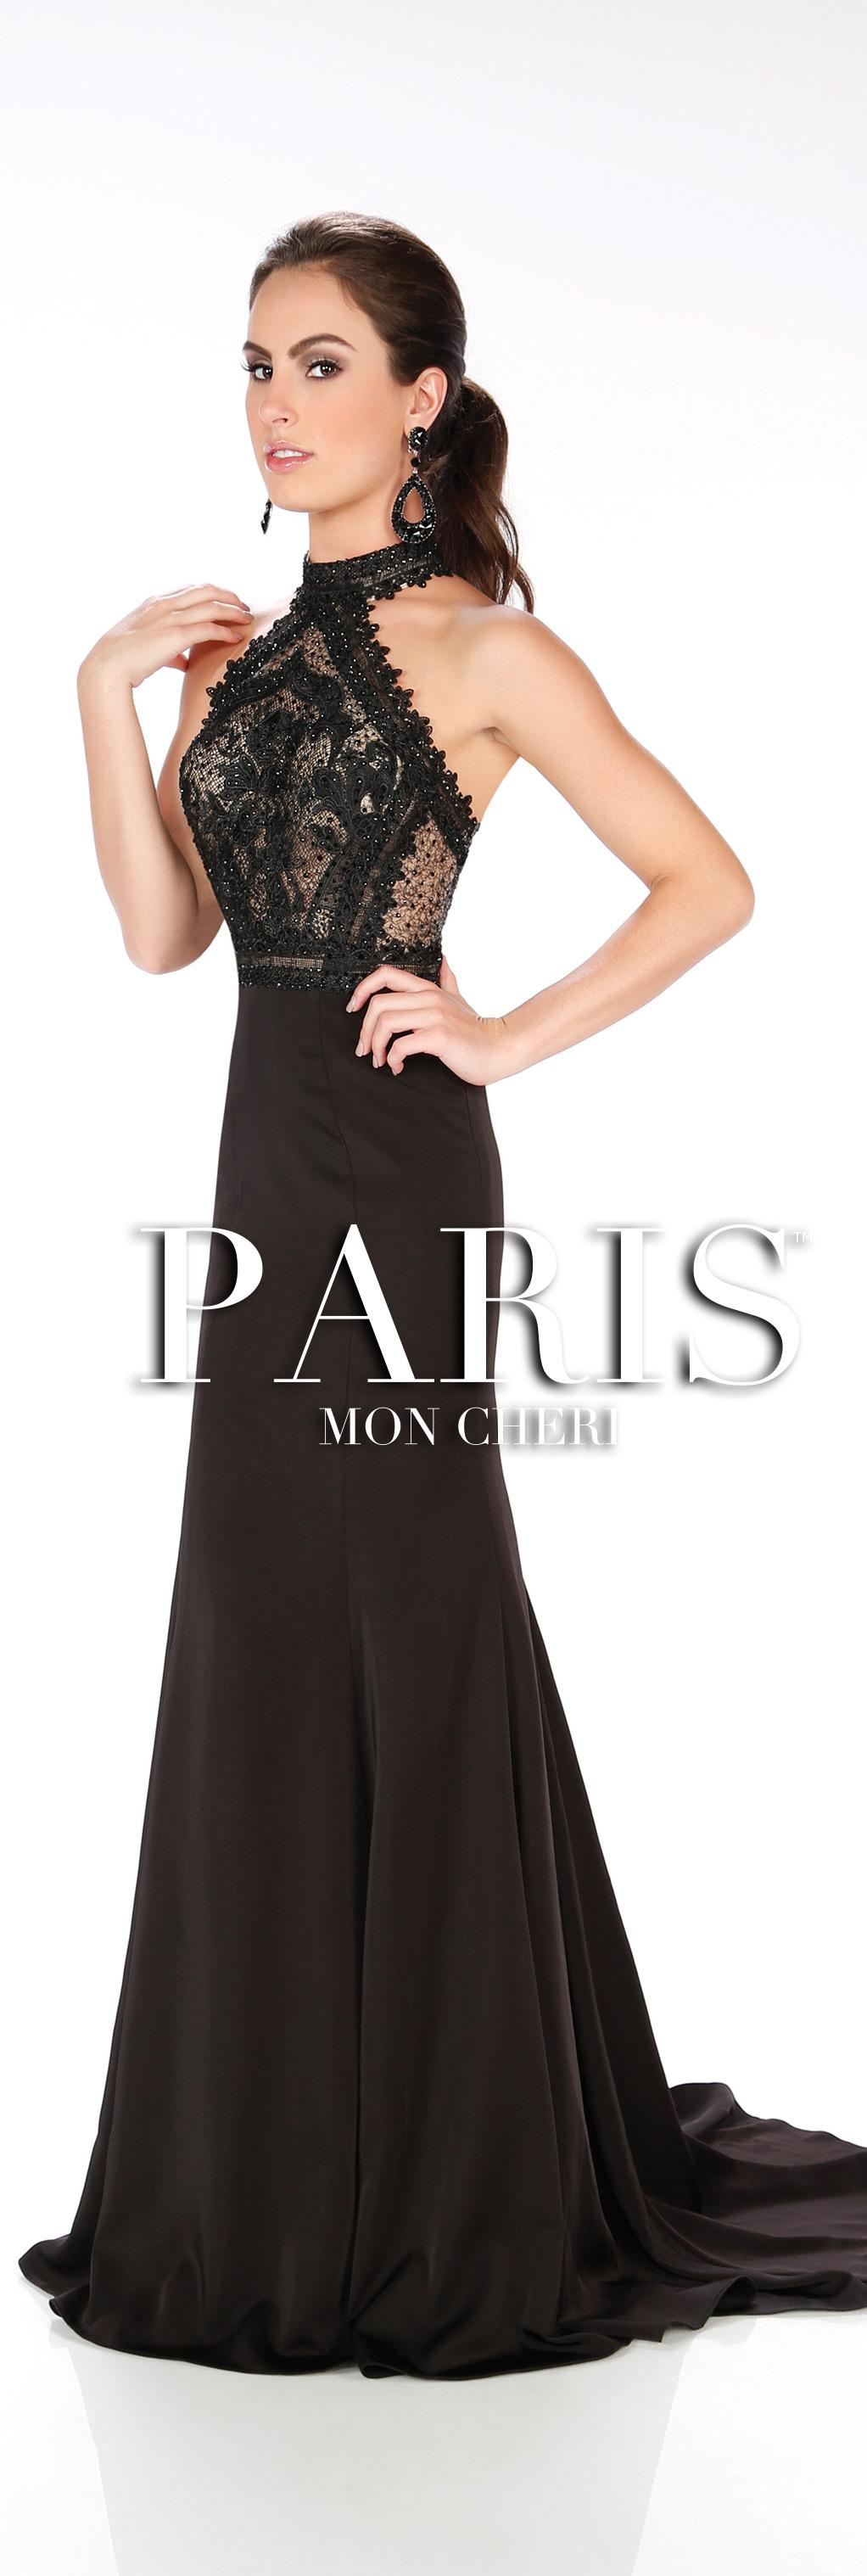 Paris by mon cheri spring style no promdresses